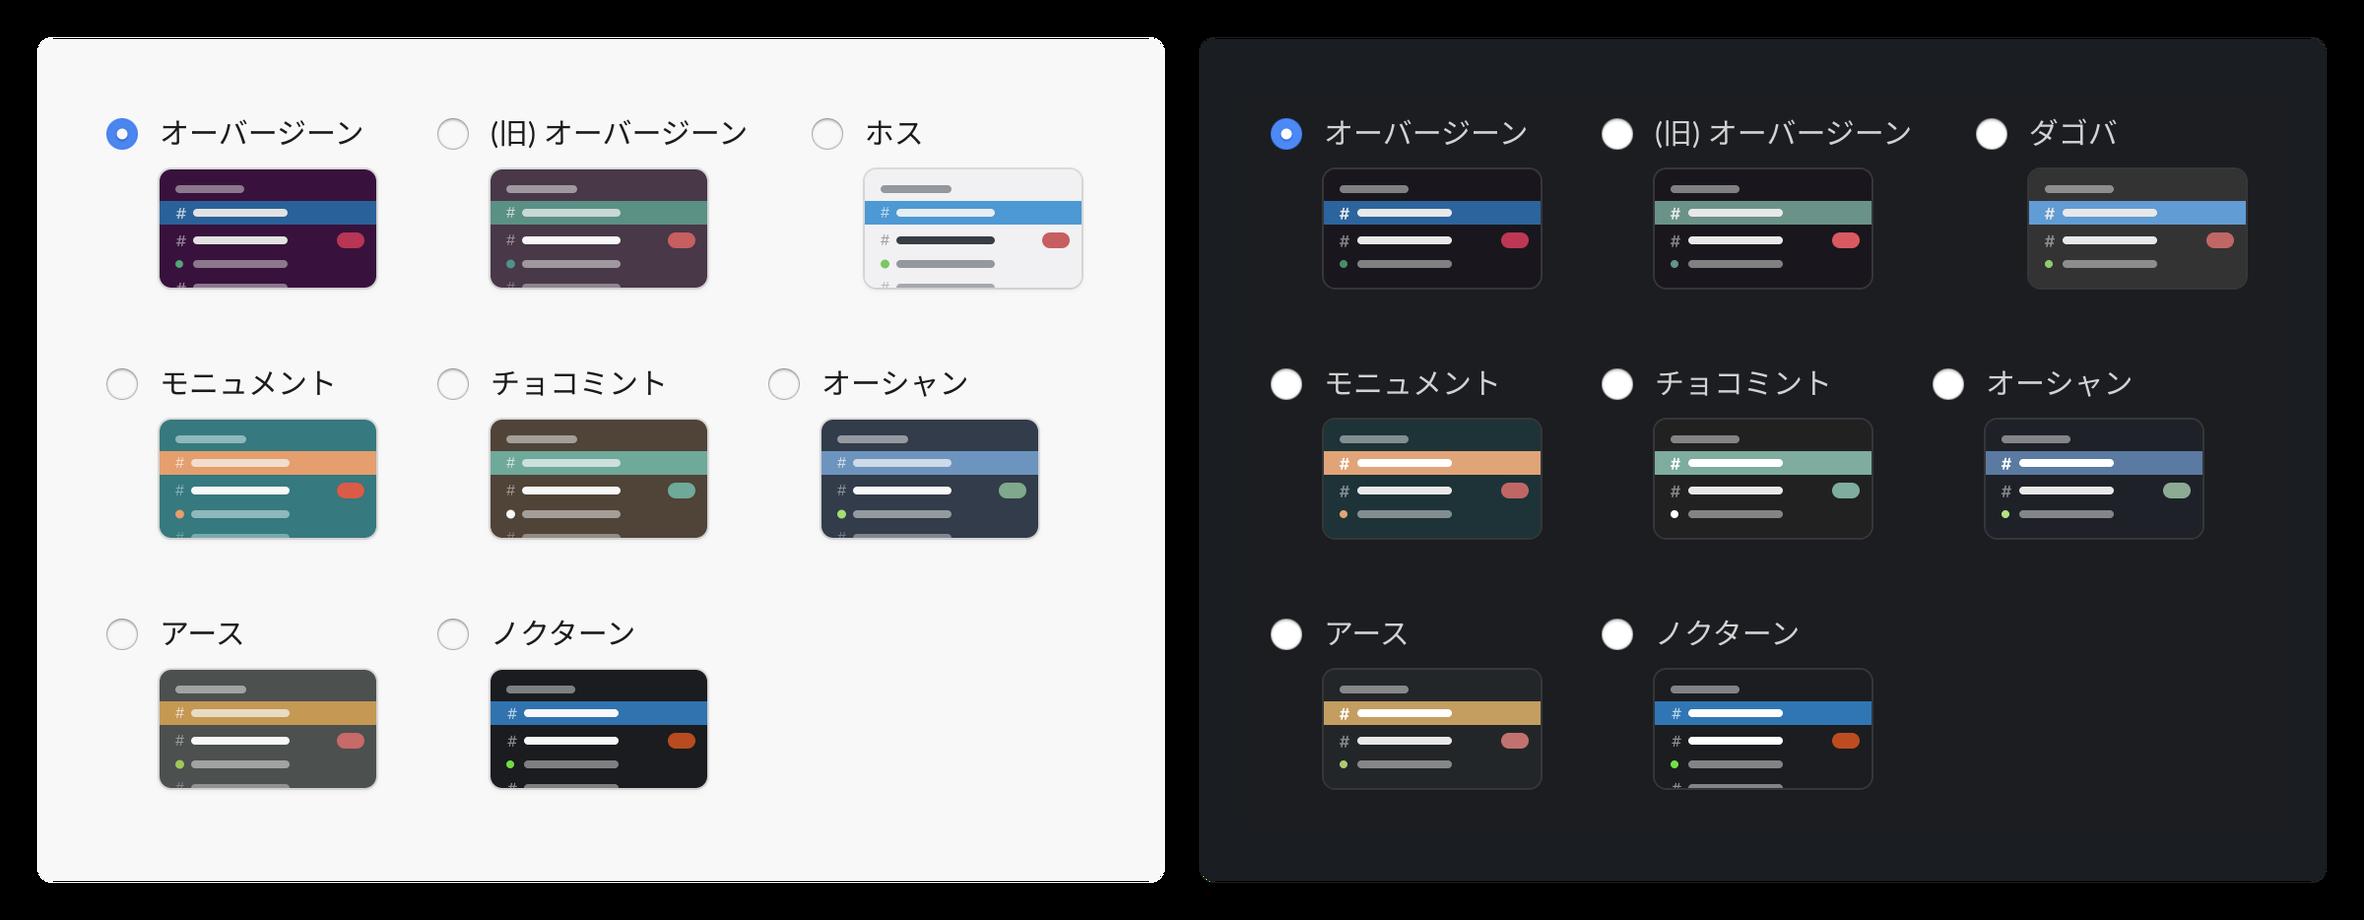 Sidebar themes for dark mode